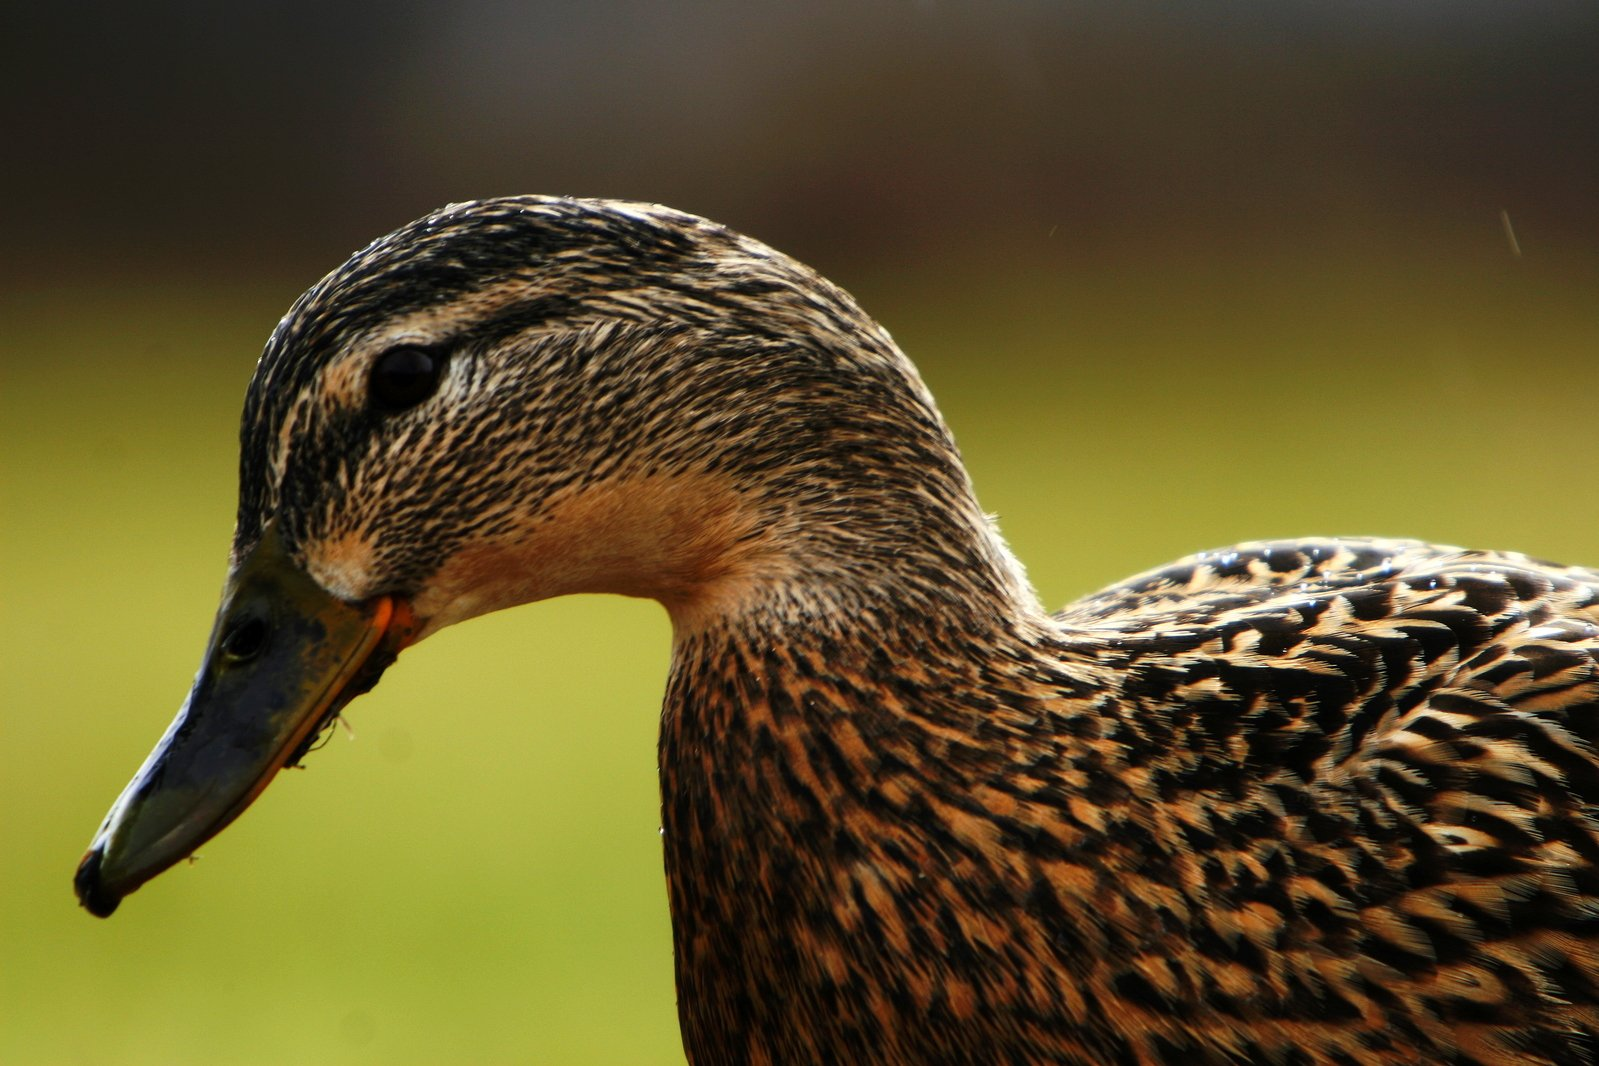 A sad-looking duck